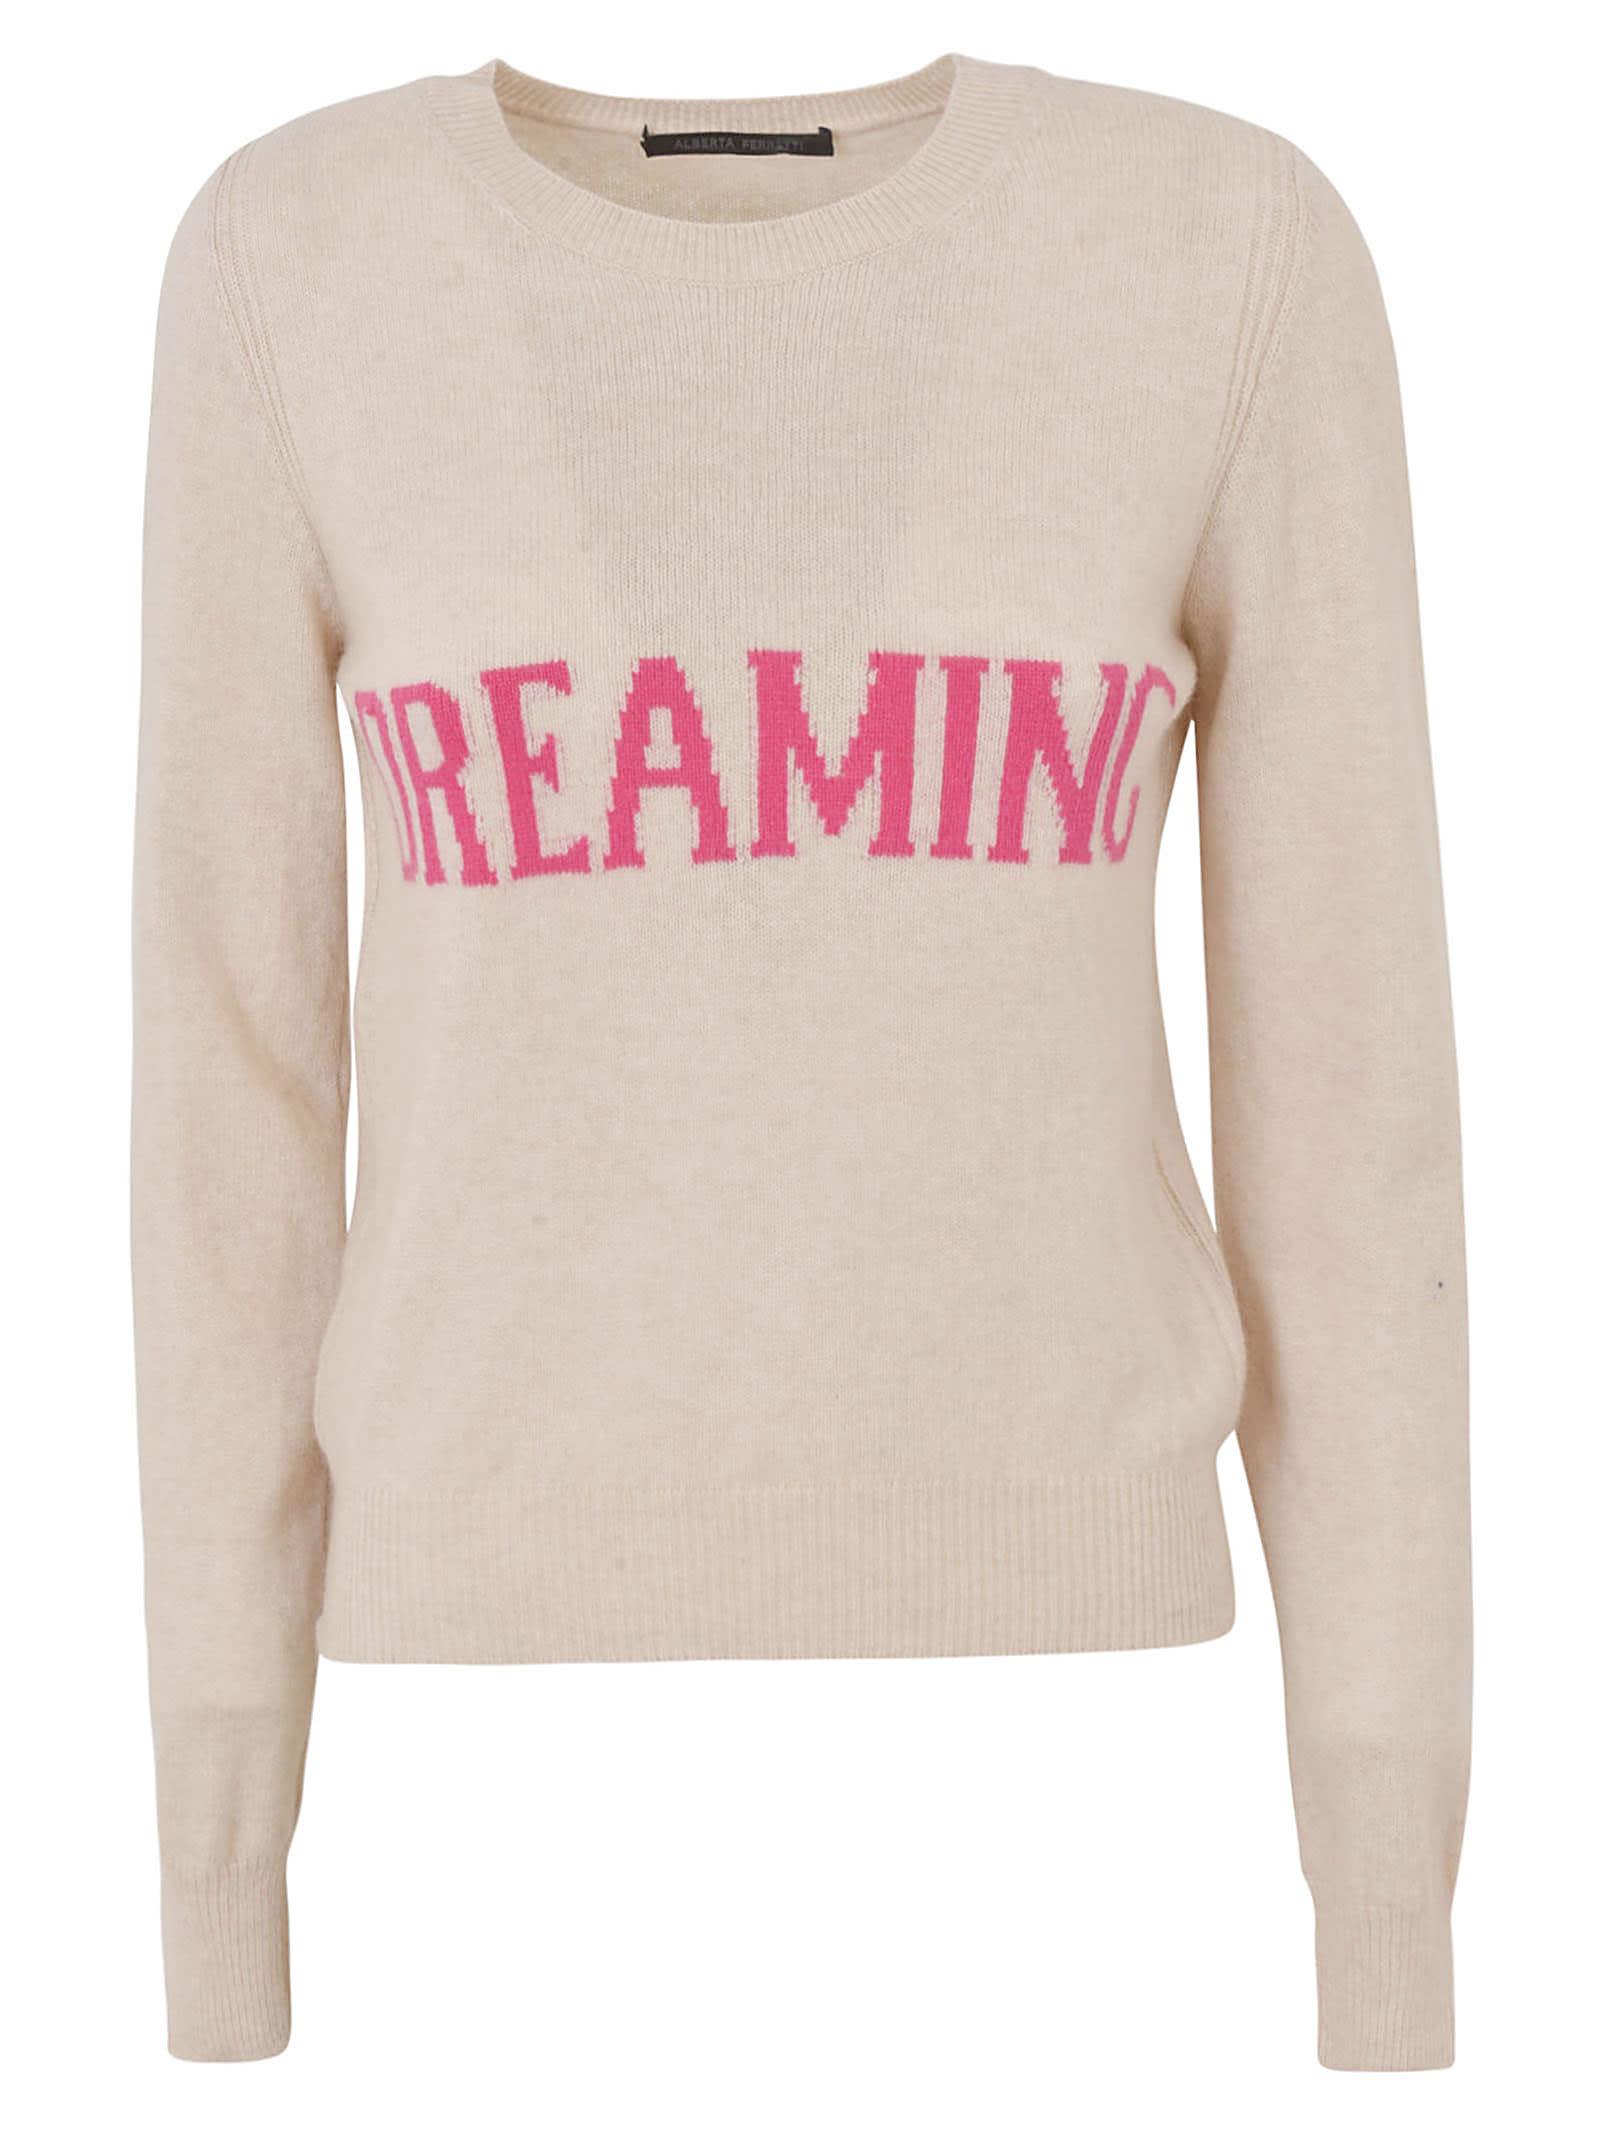 Alberta Ferretti Clothing DREAMING SWEATER